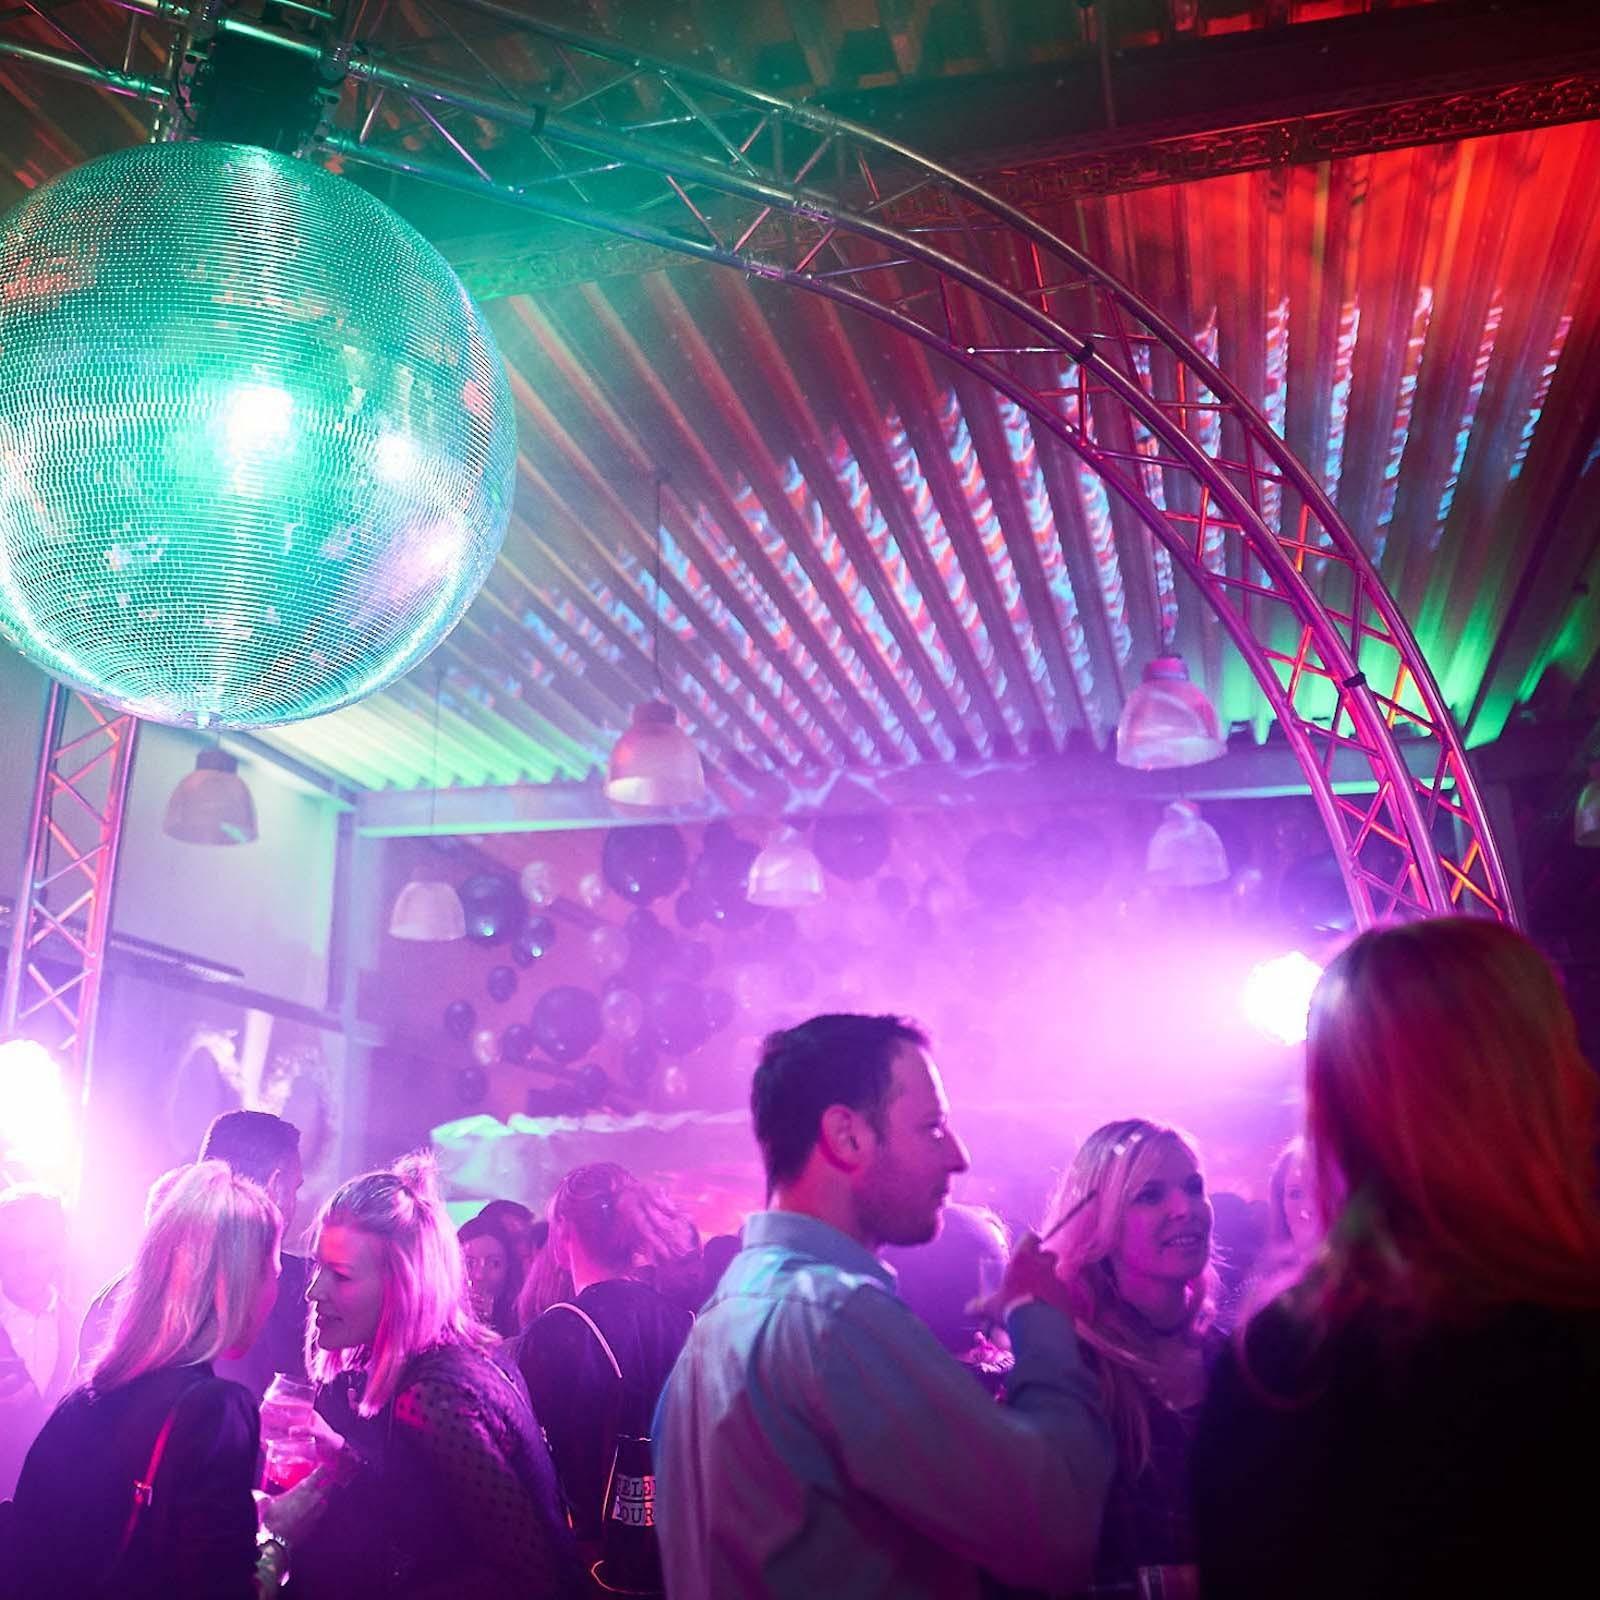 DJane | DJ | Hannover | Glitzerplatte | Lichttechnik | Tonetchnik | Club | Wedding | Event | Messe | Charity | Gala | Buchen | Mieten